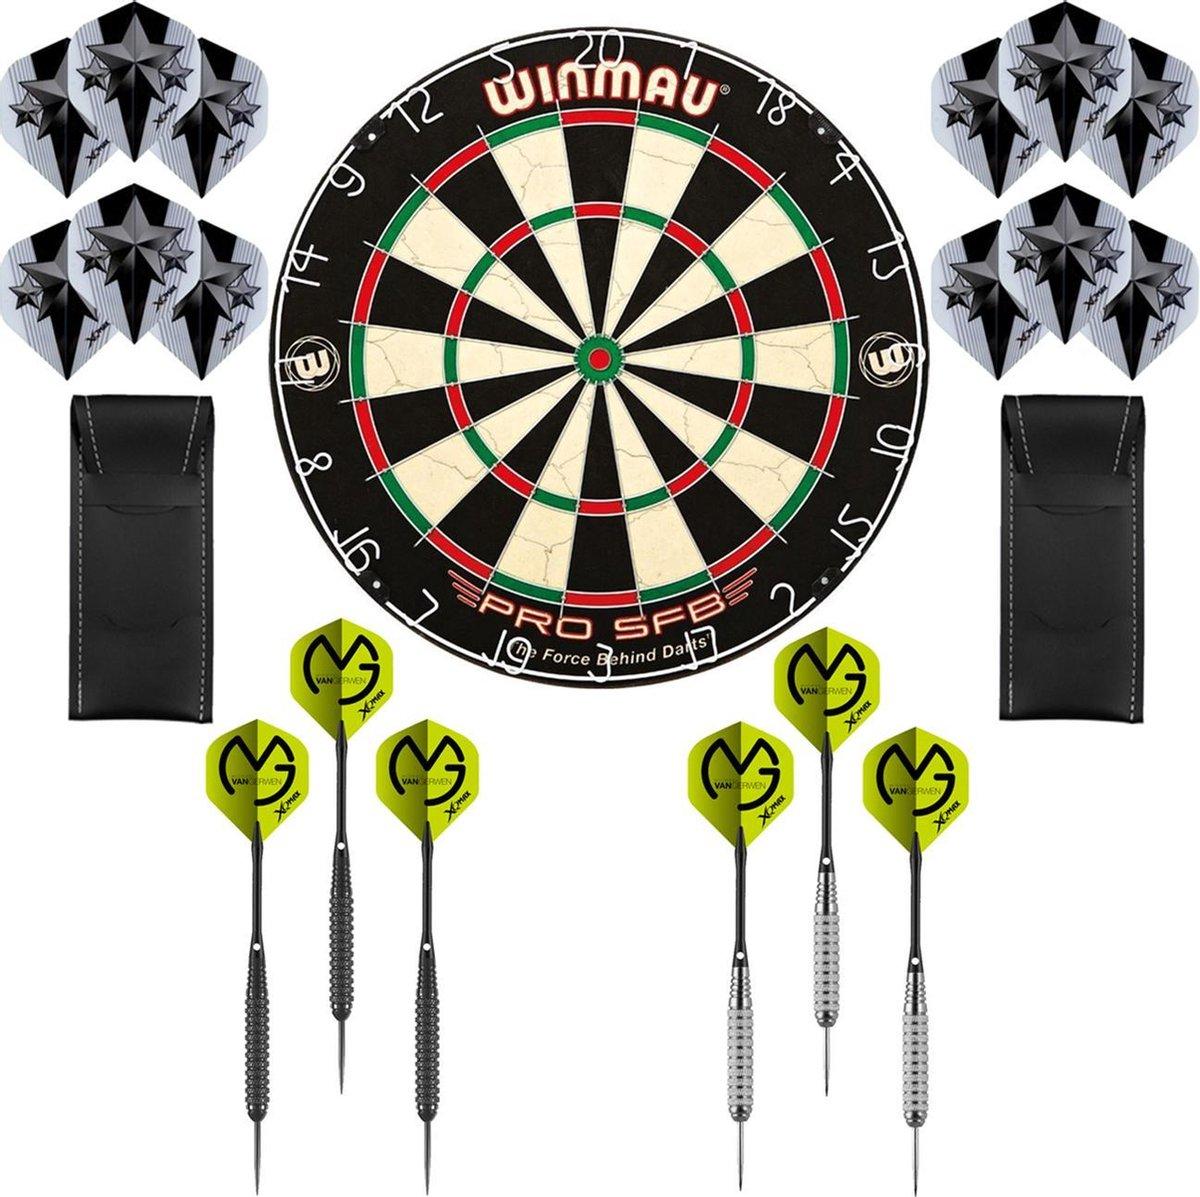 Dragon Darts Michael van Gerwen Precision set - dartbord - dartpijlen - dart shafts - dart flights - Winmau PRO SFB